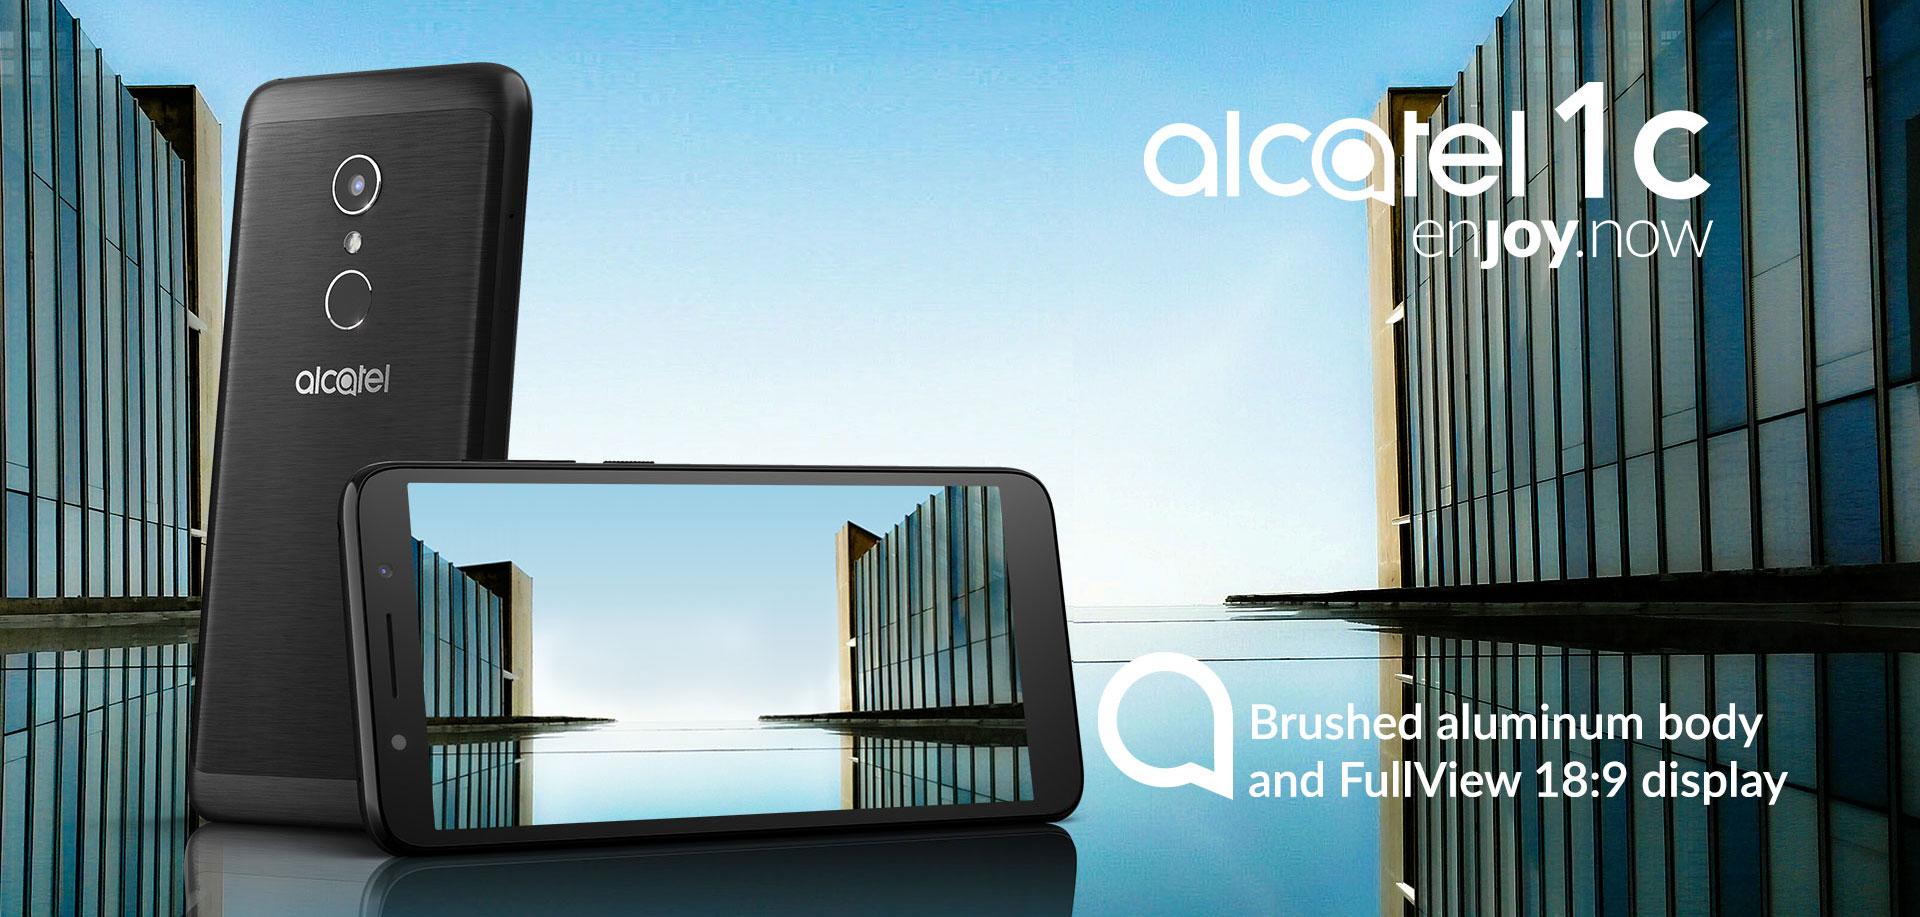 Alcatel 1C, otro gama baja de la marca francesa [MWC18] 1